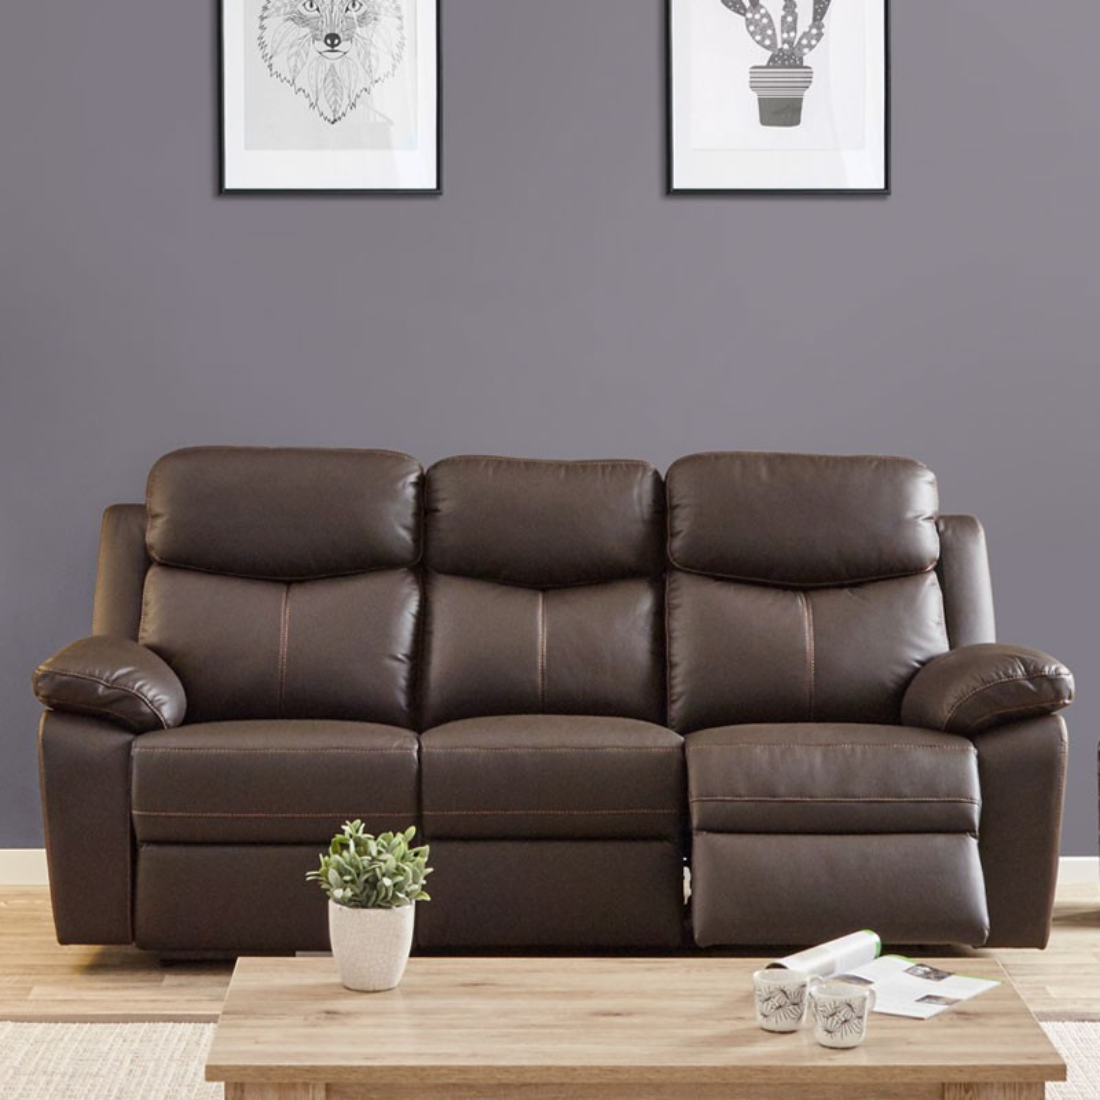 Salon complet relax lectrique cuir brun esther univers for Salon moderne complet